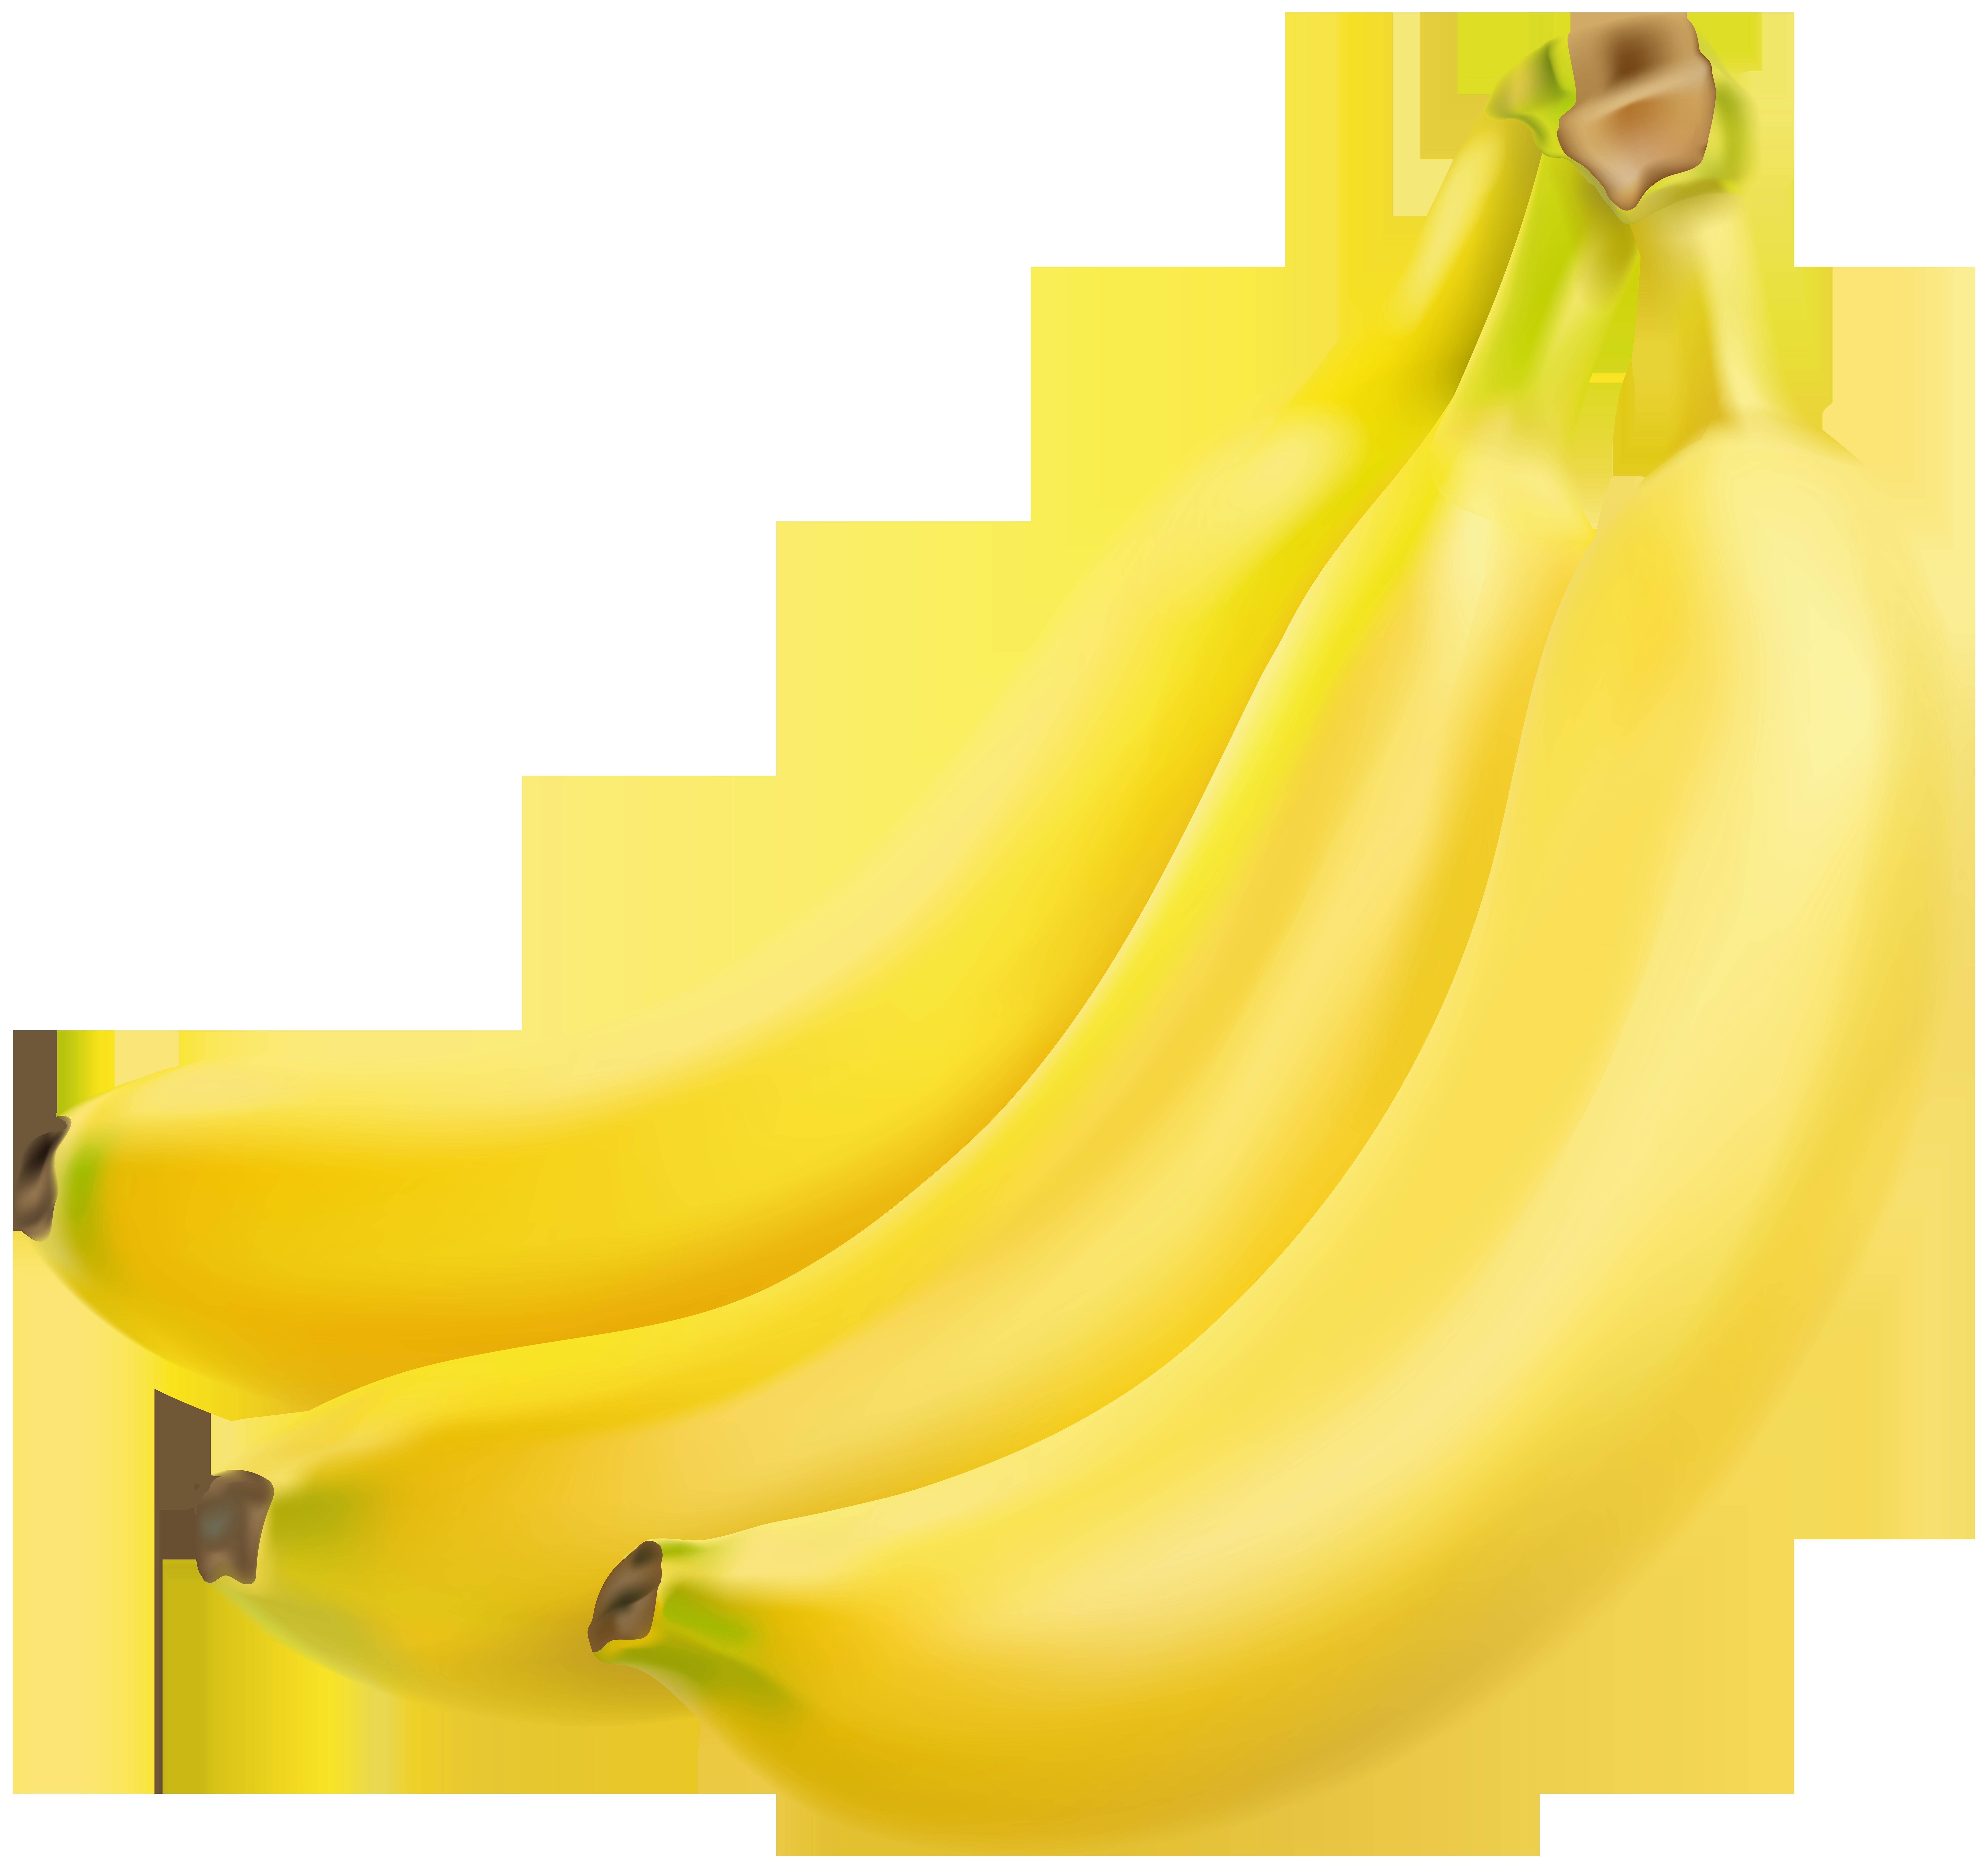 Banana clipart high quality. Bananas transparent image gallery